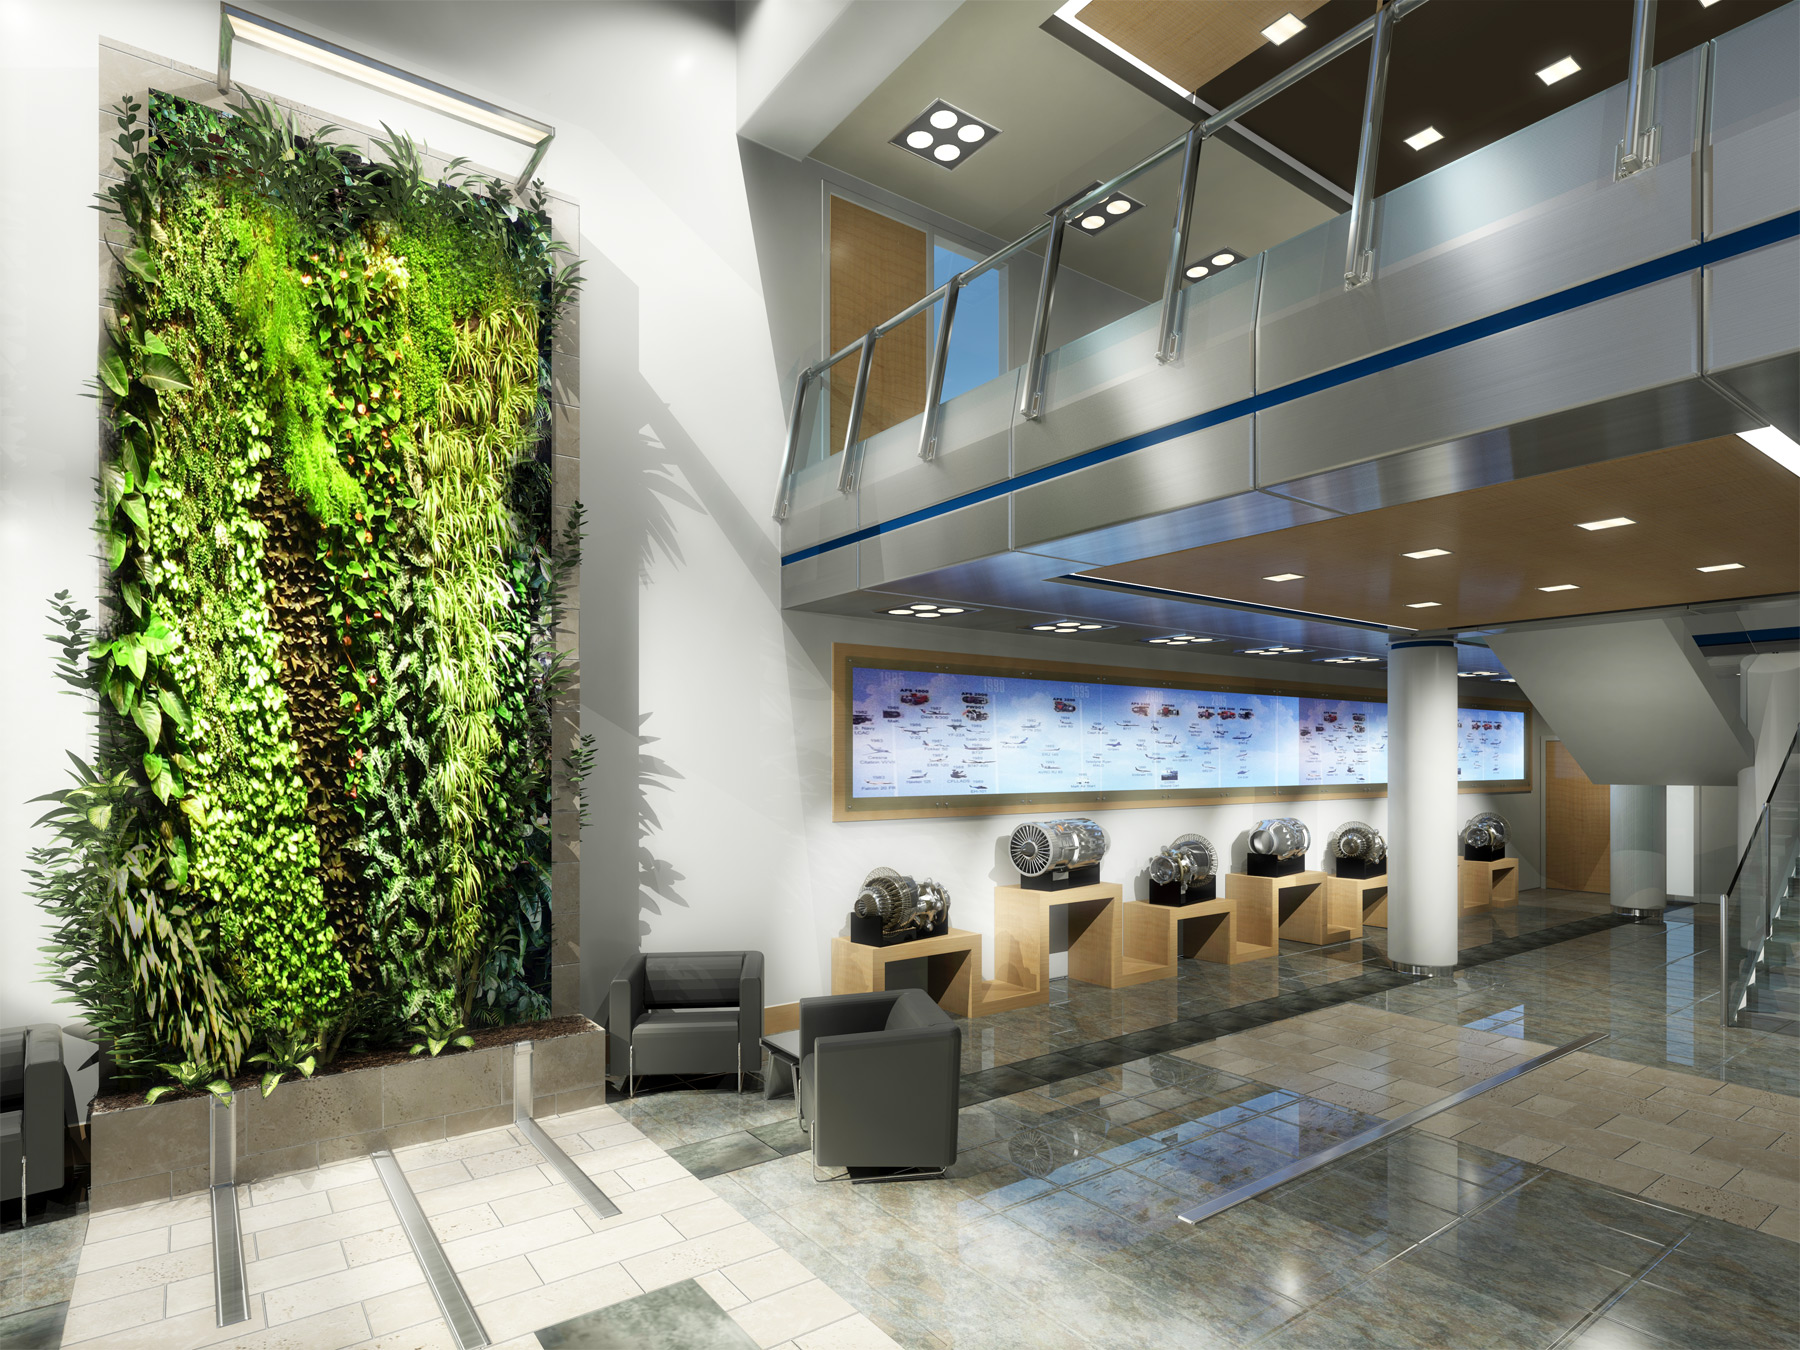 Hamilton Sundstrand Office Interior Design